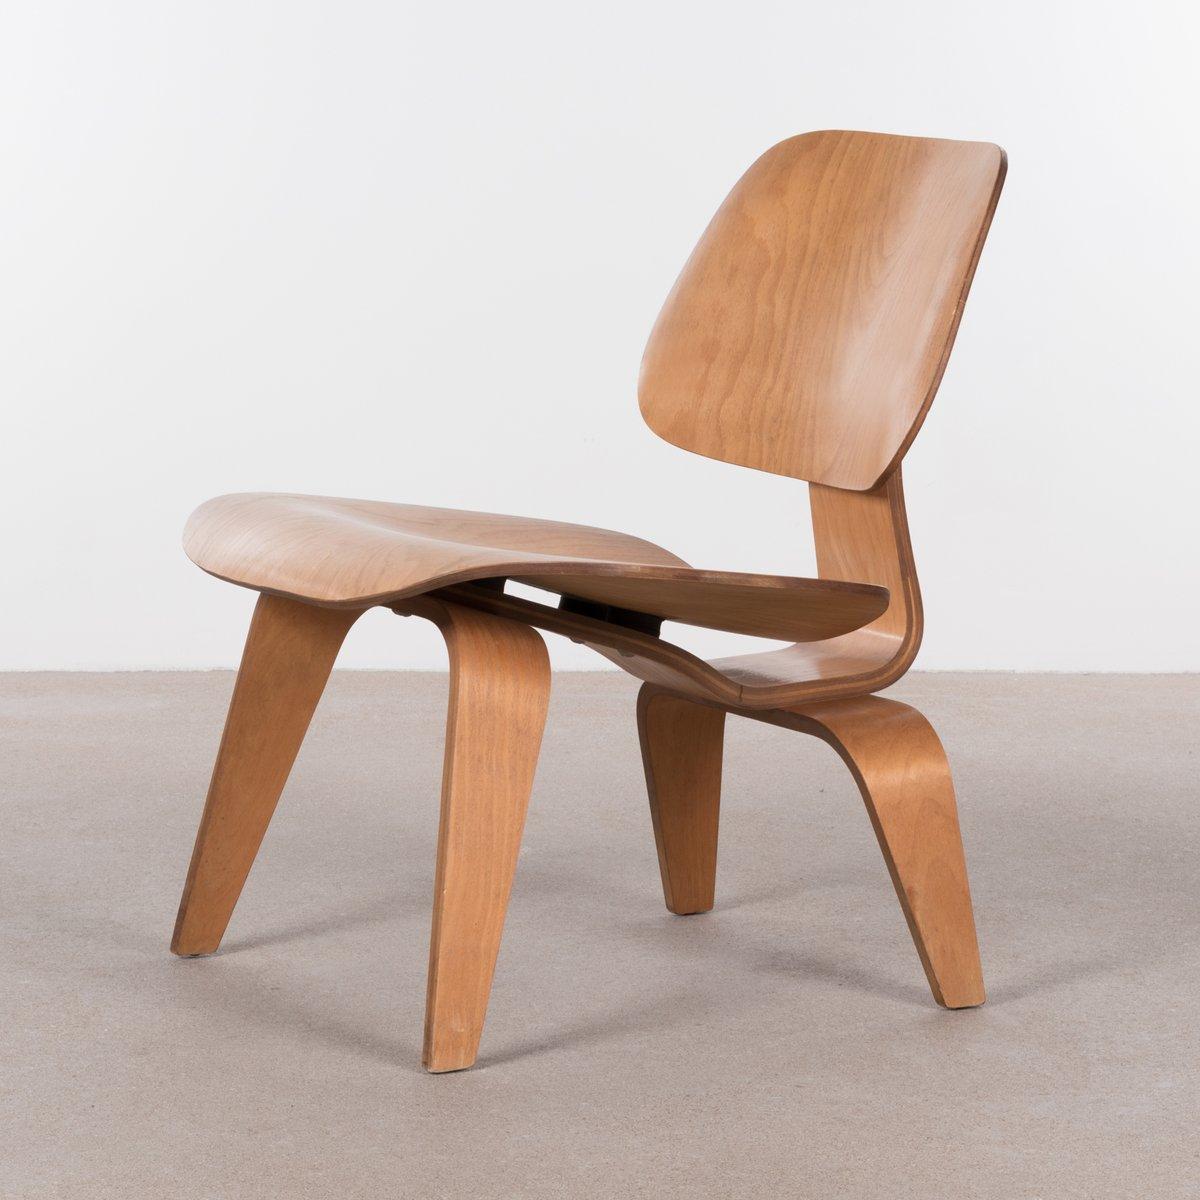 amerikanischer lcw ahorn stuhl von charles ray eames f r. Black Bedroom Furniture Sets. Home Design Ideas